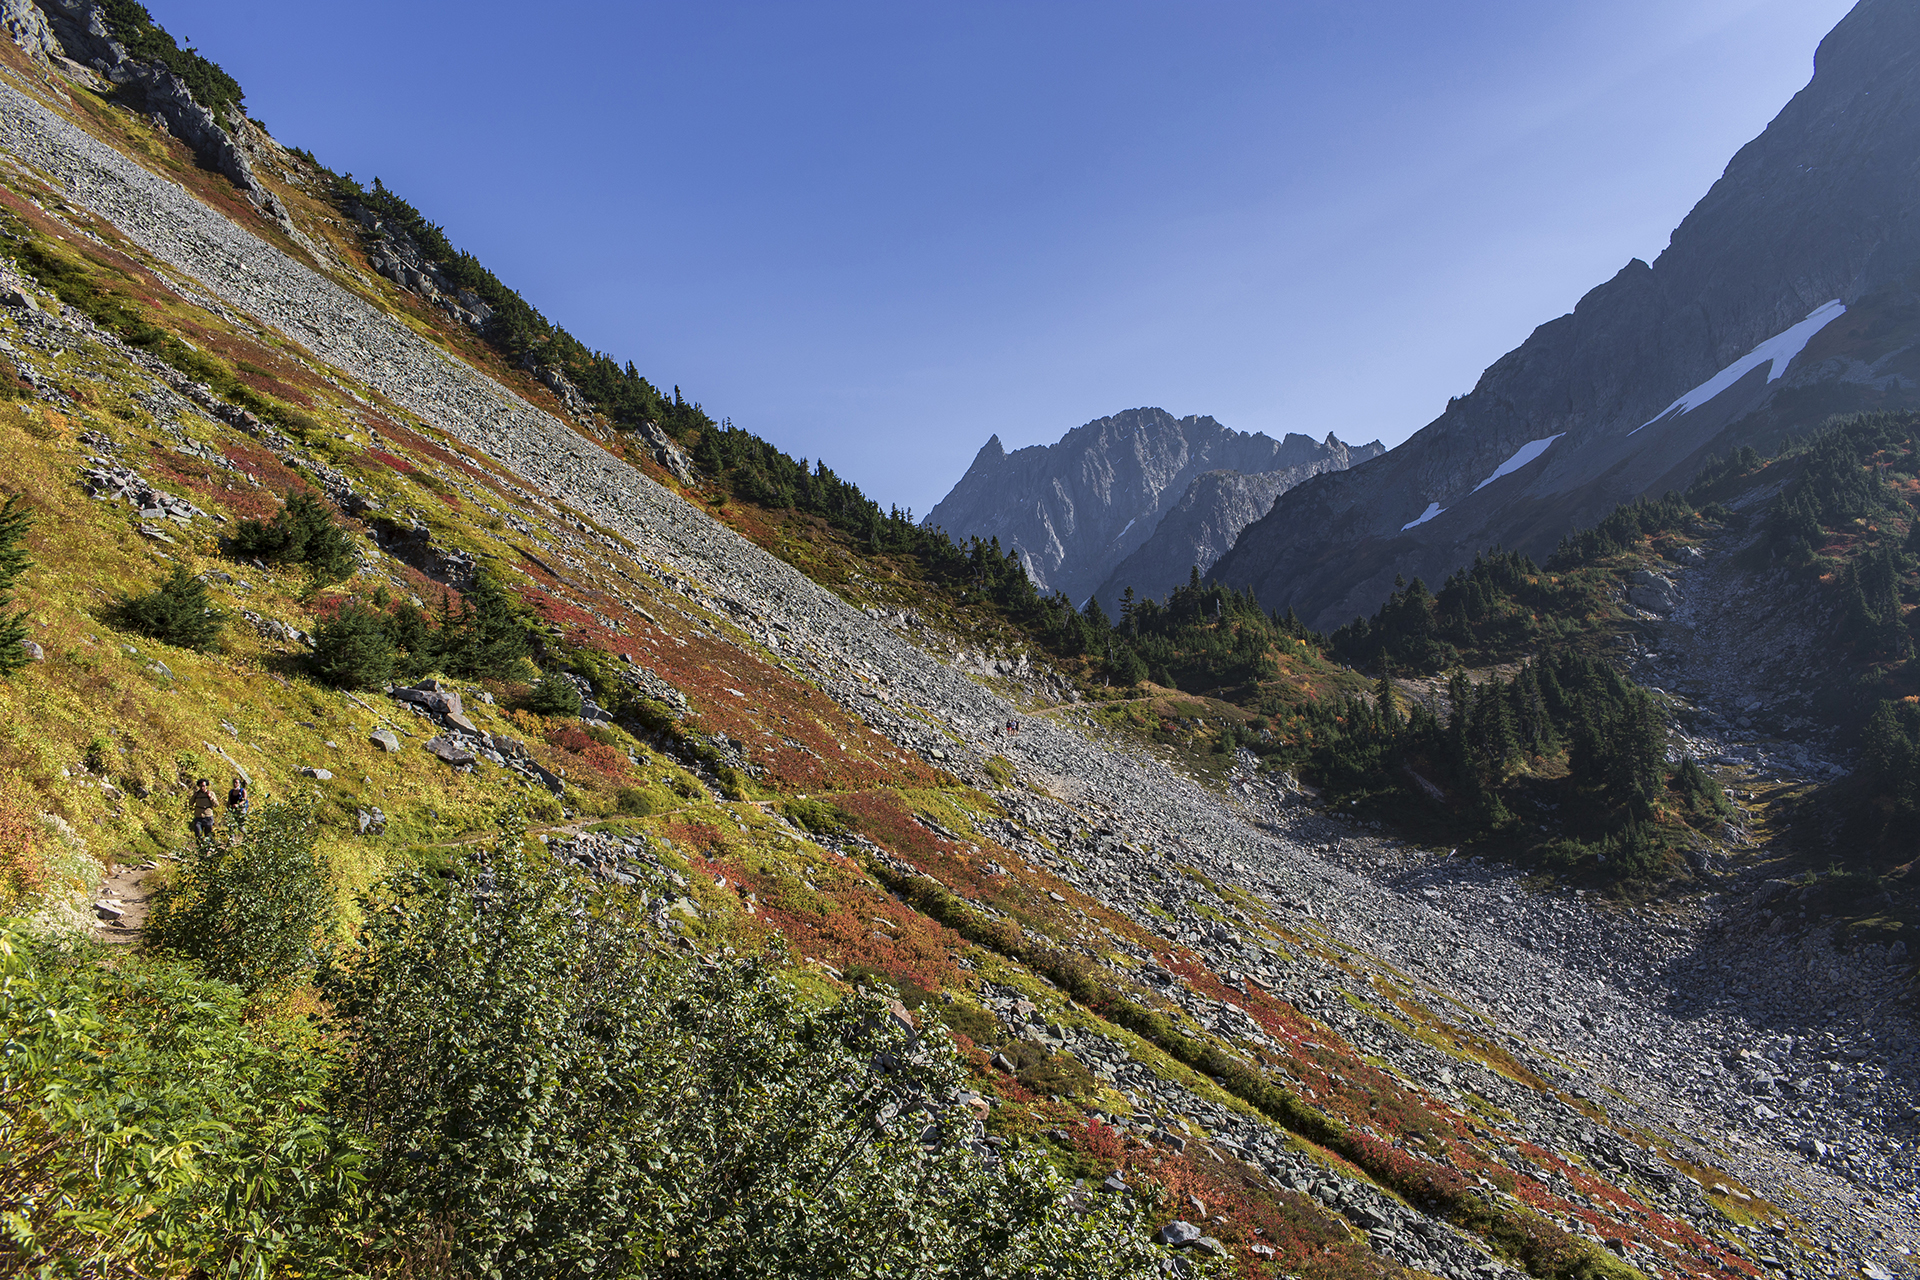 North Cascades追秋追进坑里 | 抛锚深山的求救指南